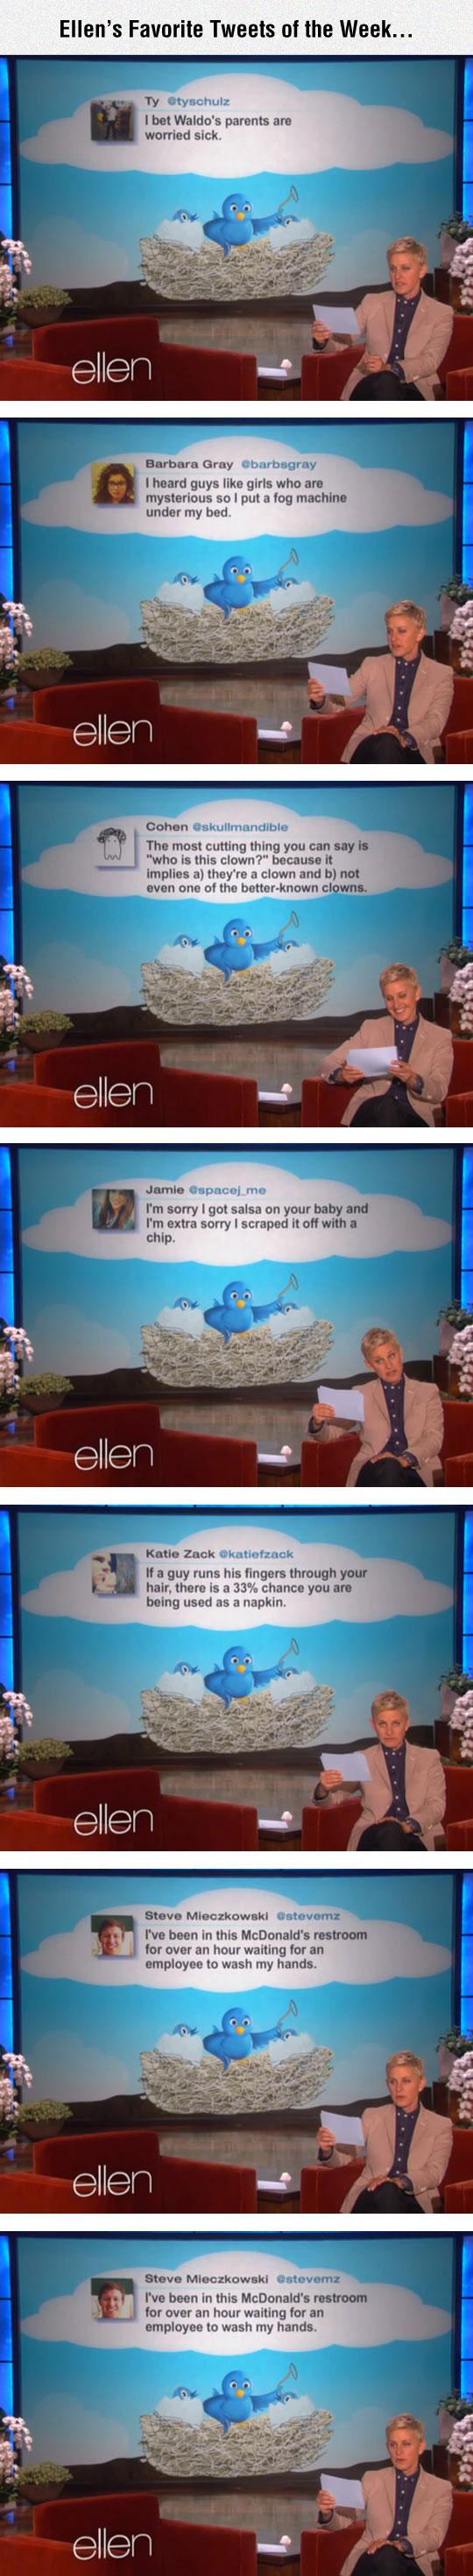 Ellen's Favorite Tweets Of The Week